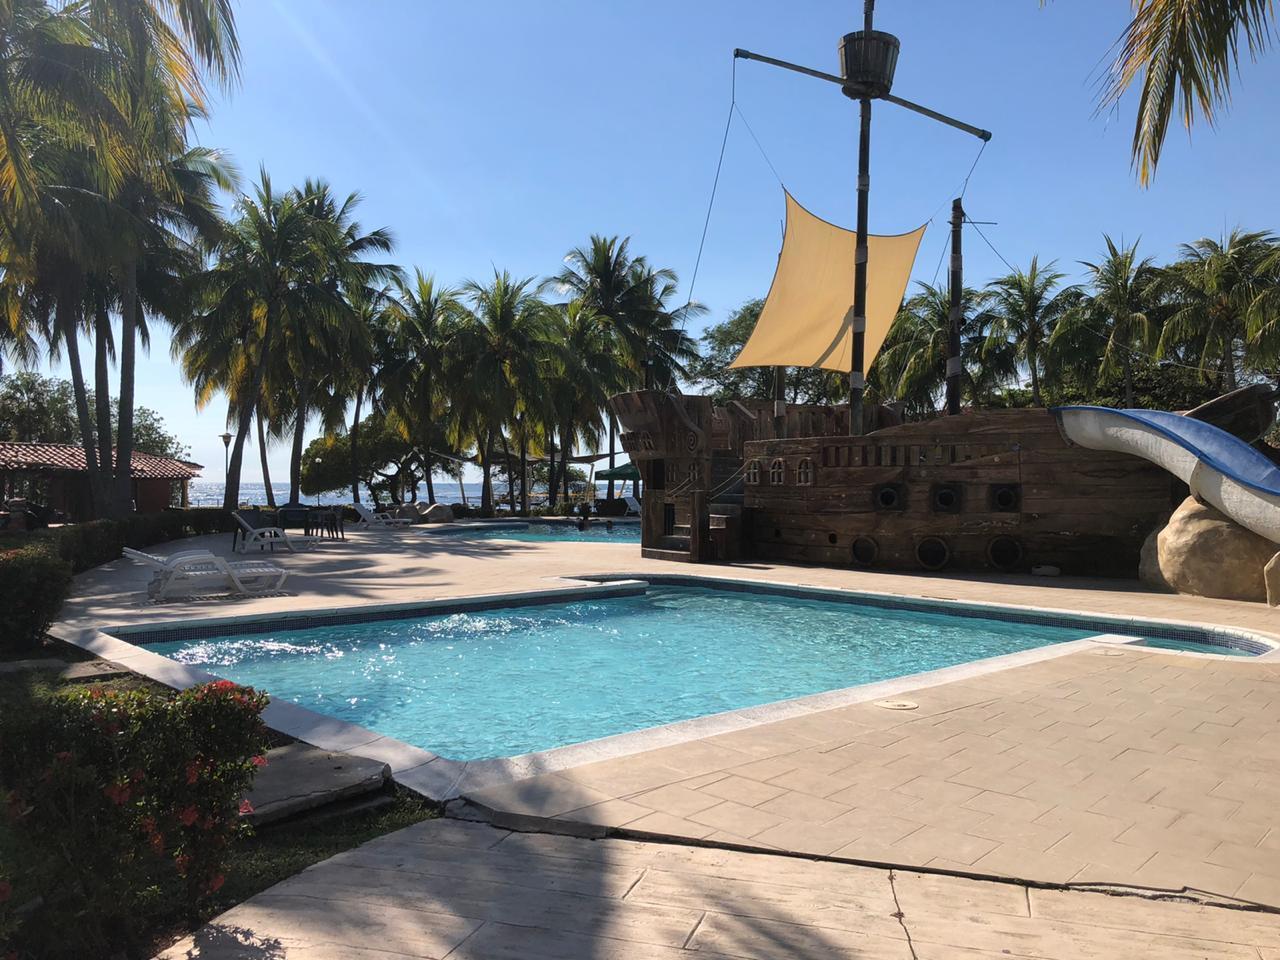 Las Veraneras Villas & Resort